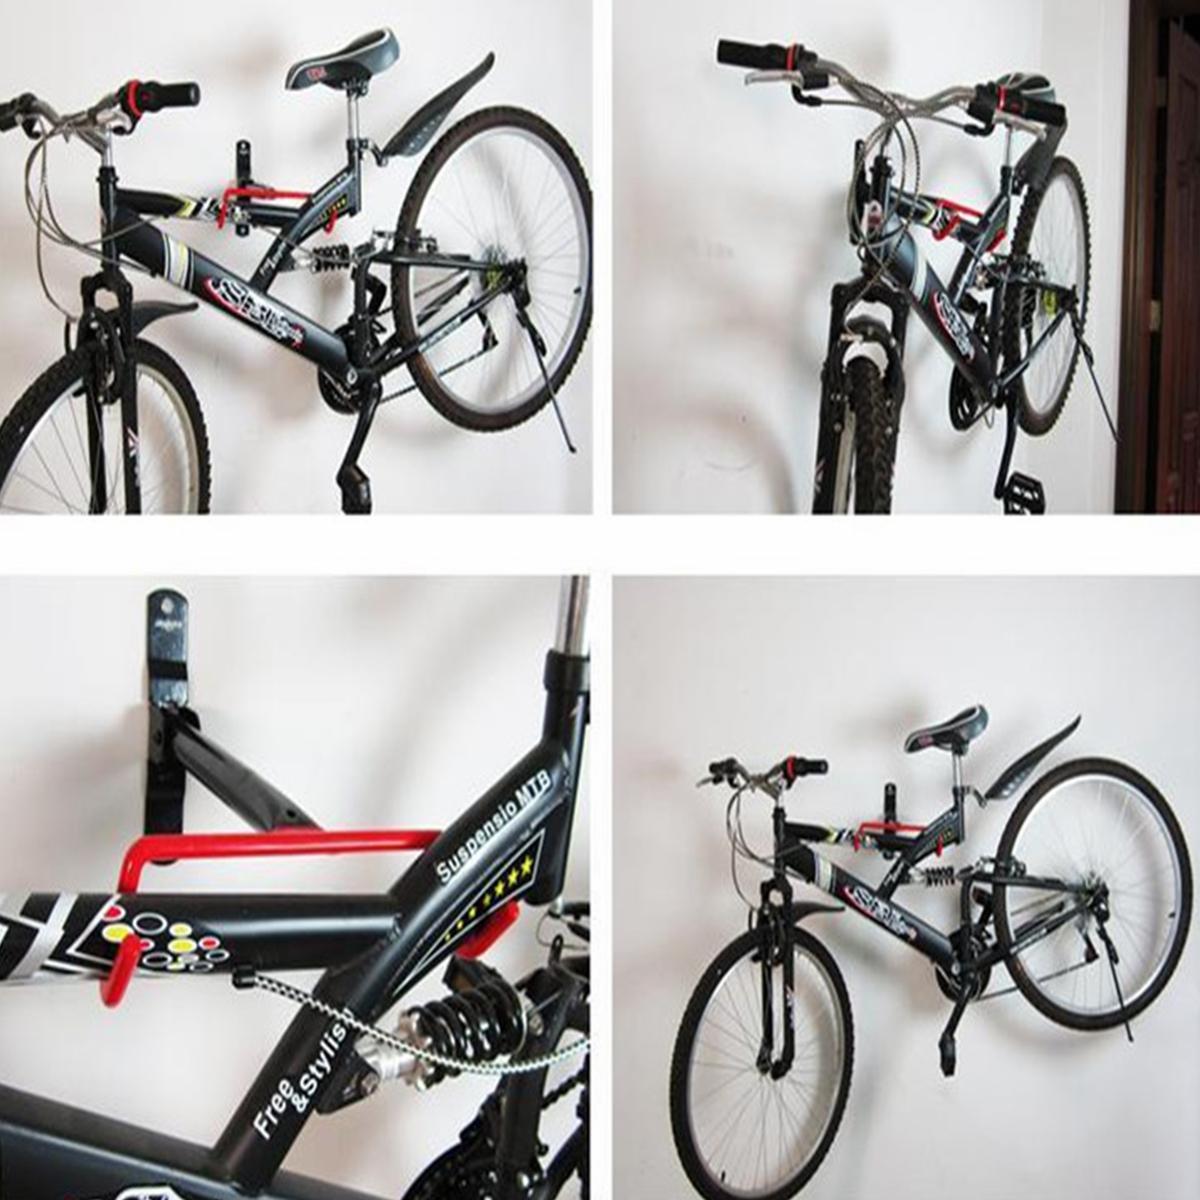 Cycling Bicycle Storage Garage Wall Mount Rack Bike Steel